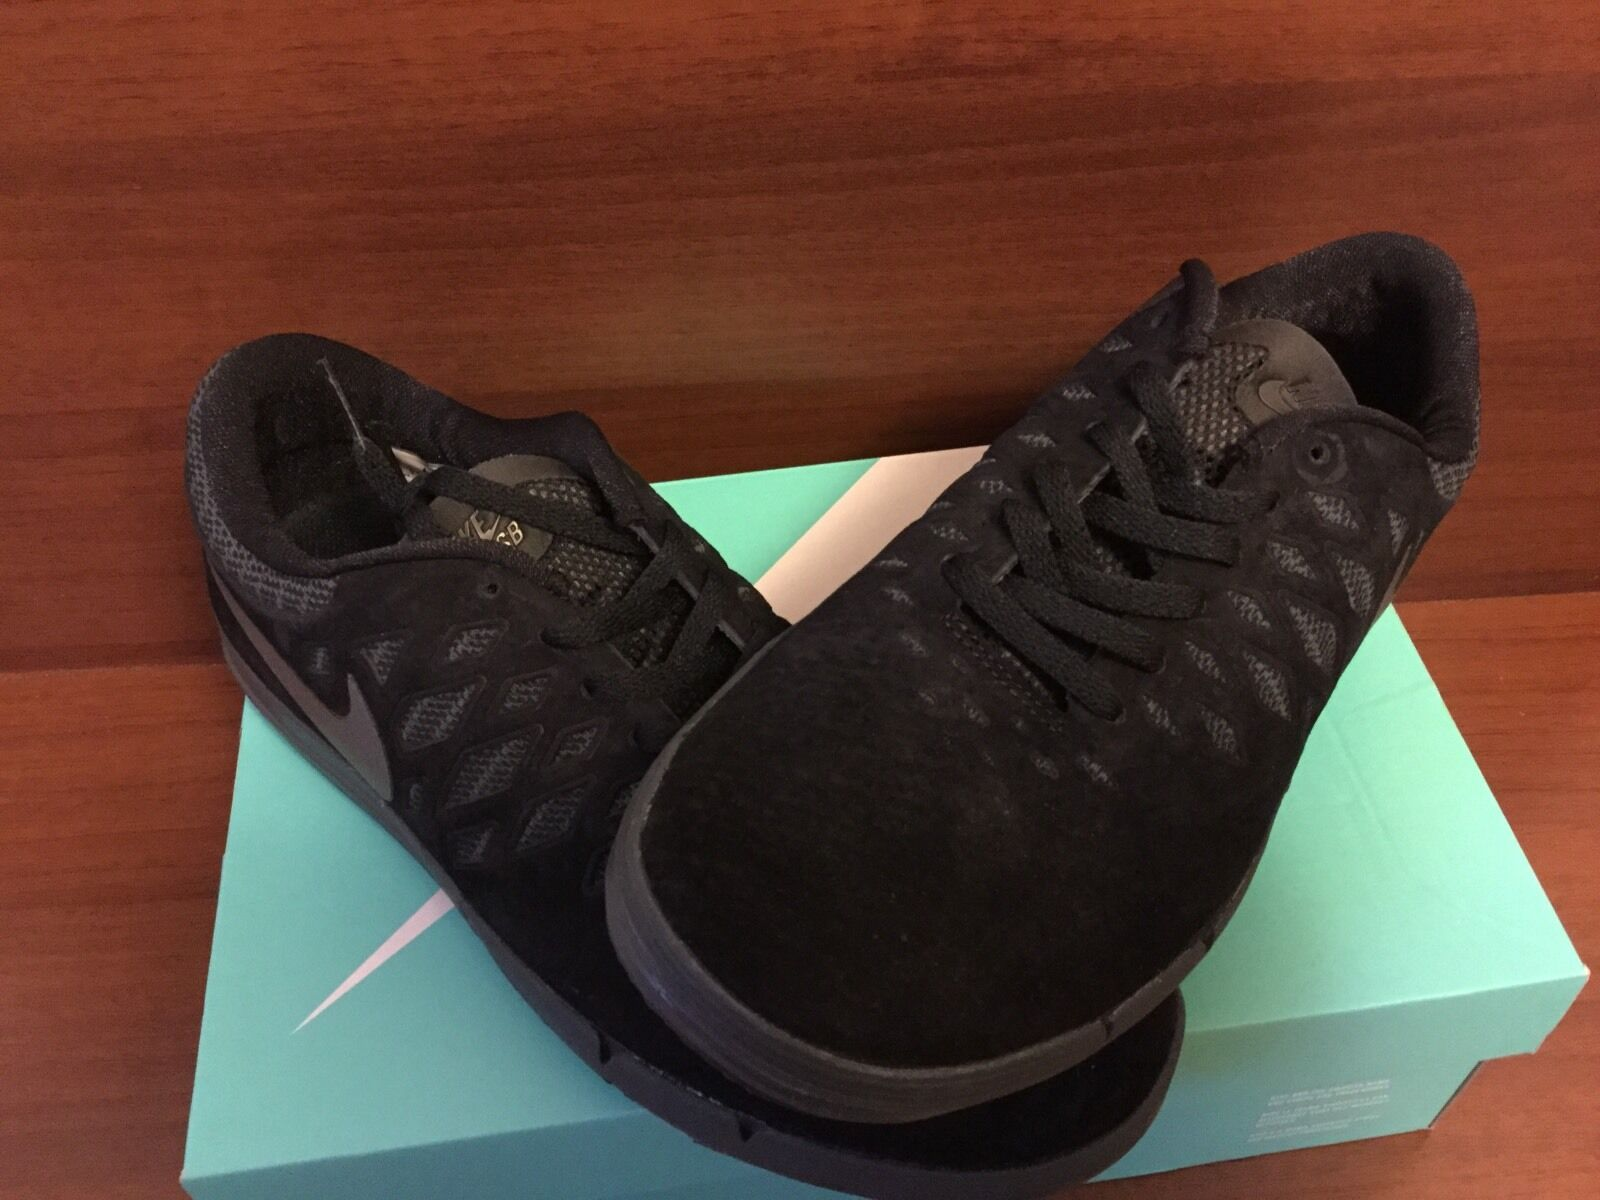 Nike Free SB PRM Black Anthracite 743184 001 NIB Size 9.5